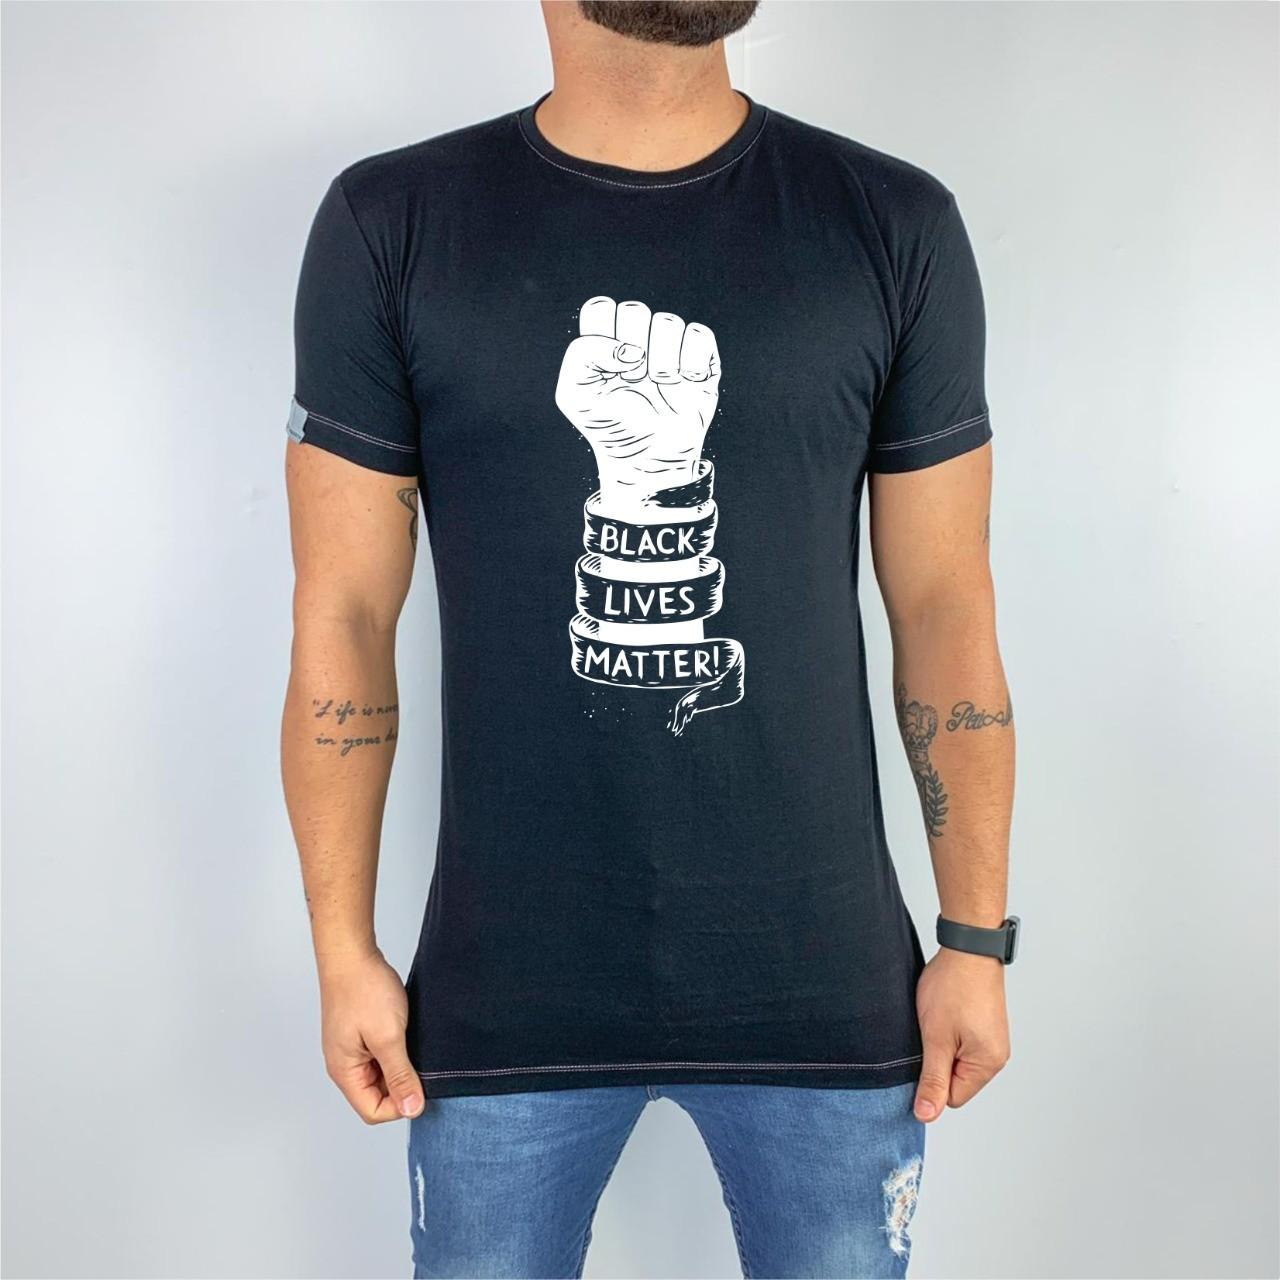 Camiseta Vidas negras importam